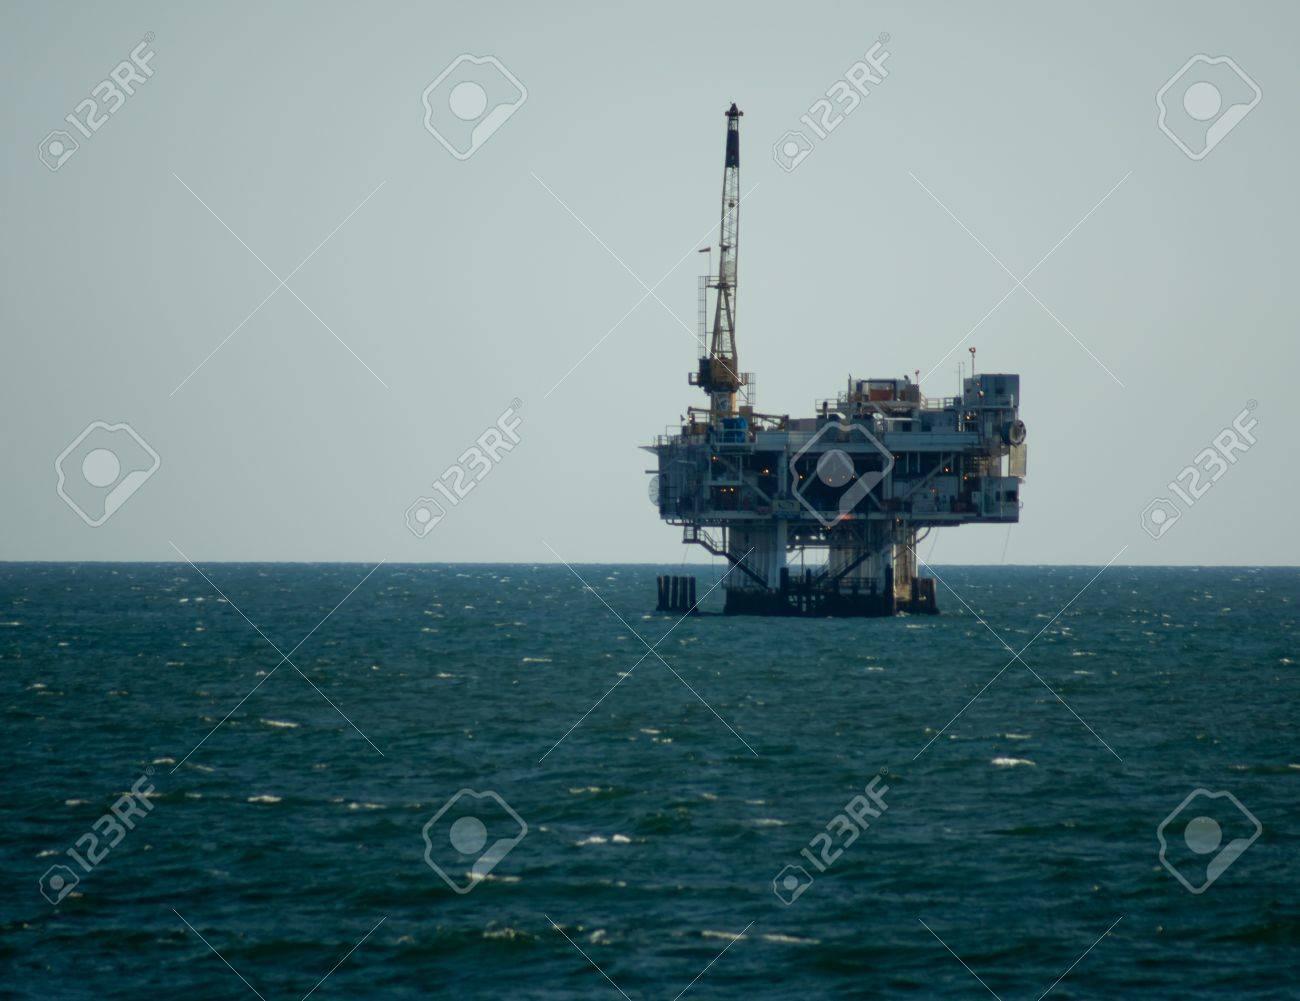 Oil platform located off shore of Huntington Beach, California Stock Photo - 13289663